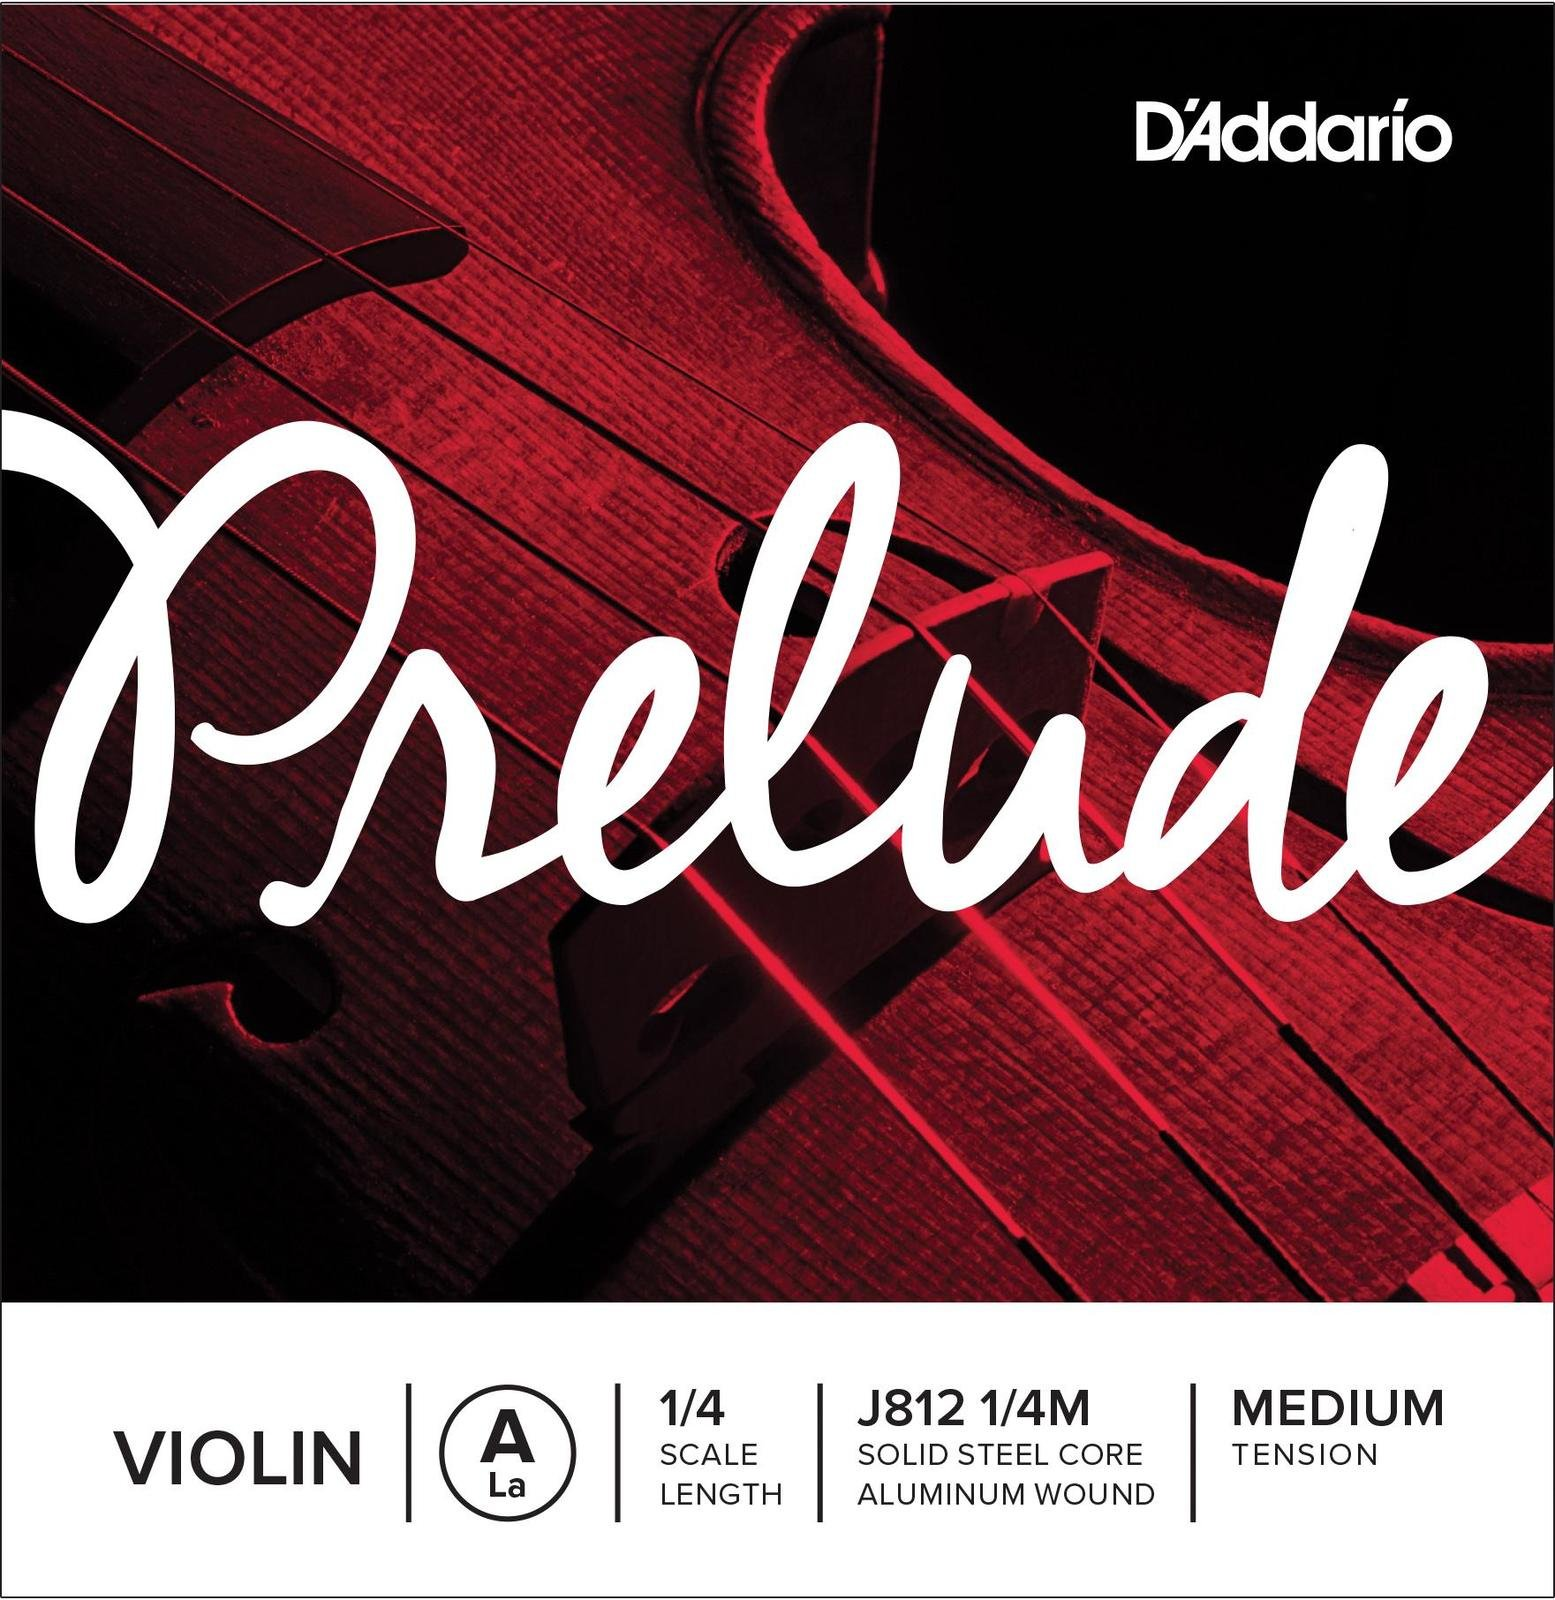 PRELUDE Violin A MED 1/4